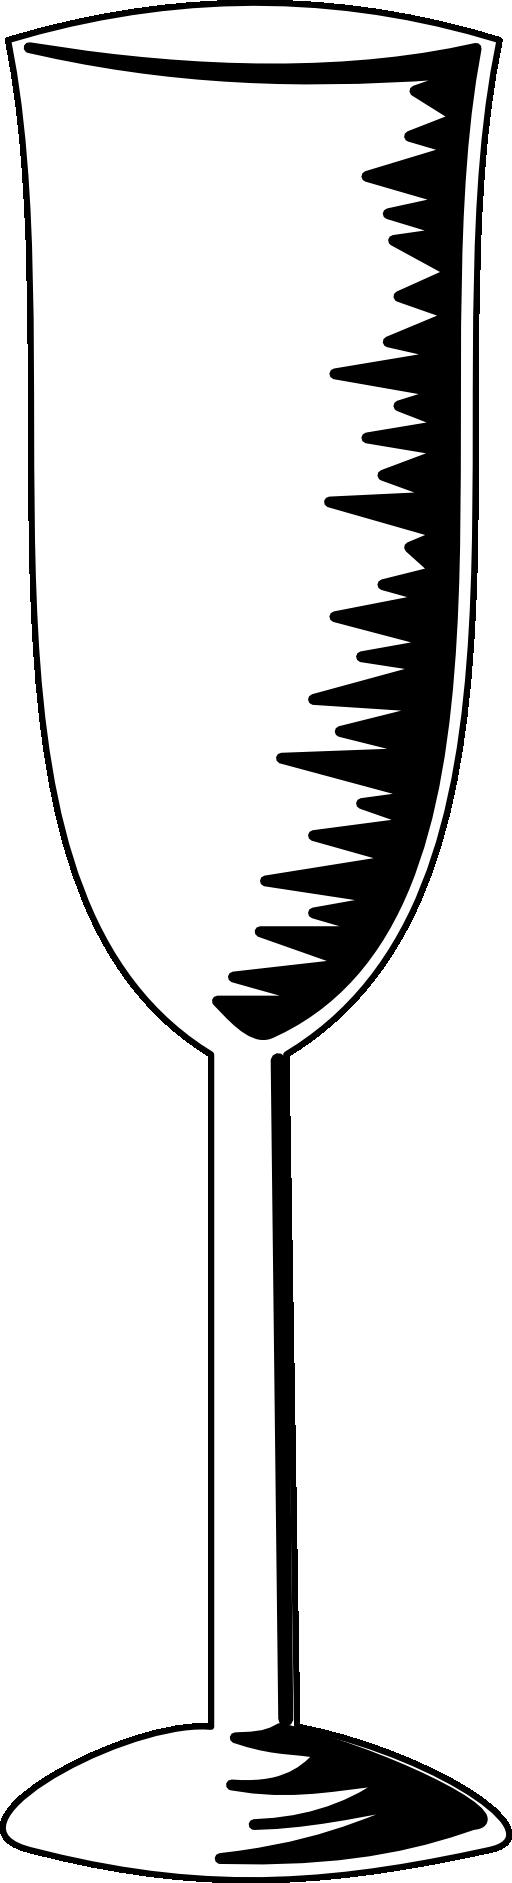 Champagne Glass Clipart Champagne glass clipart